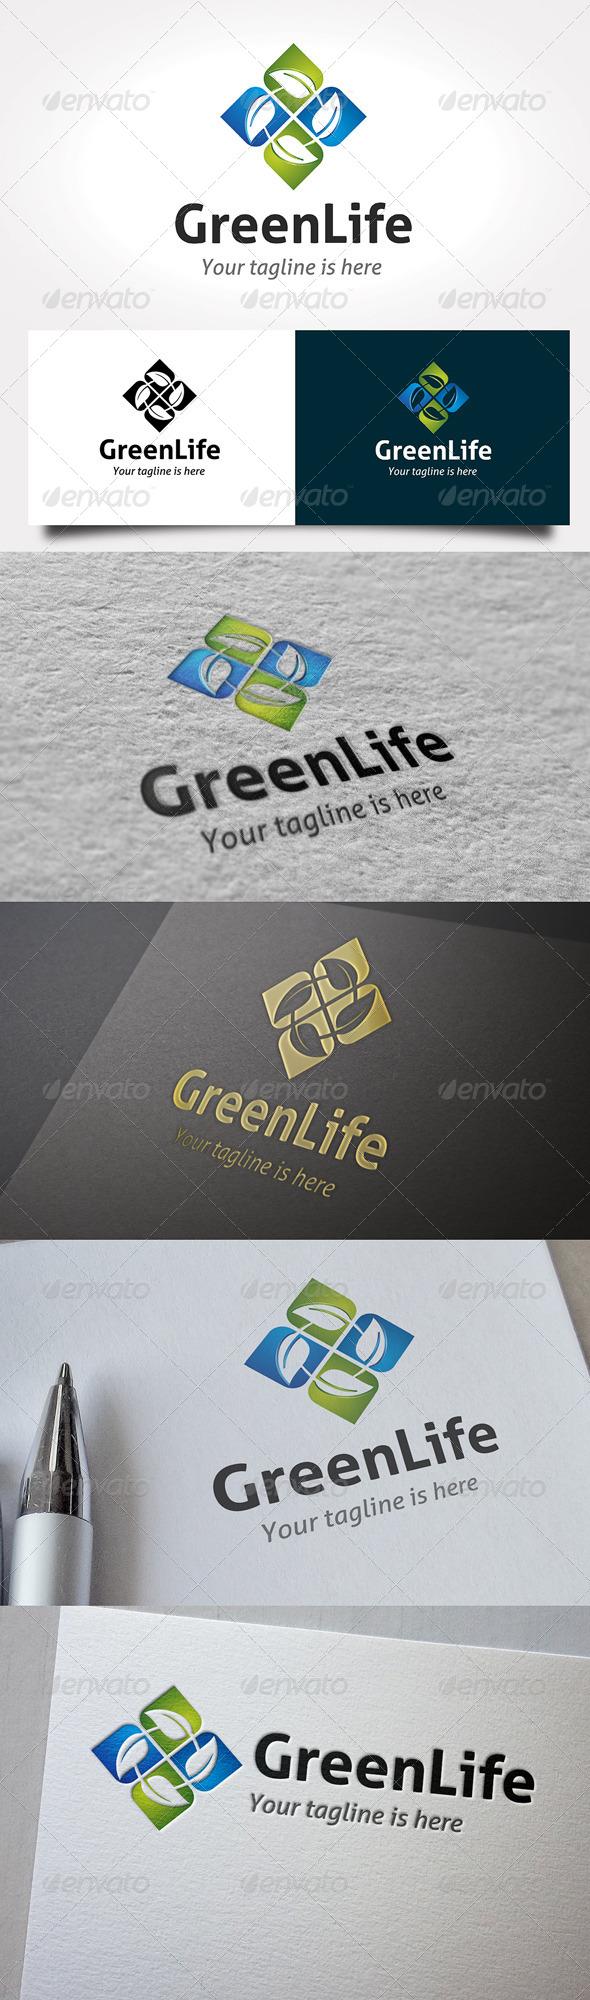 Green Life Logo - 3d Abstract